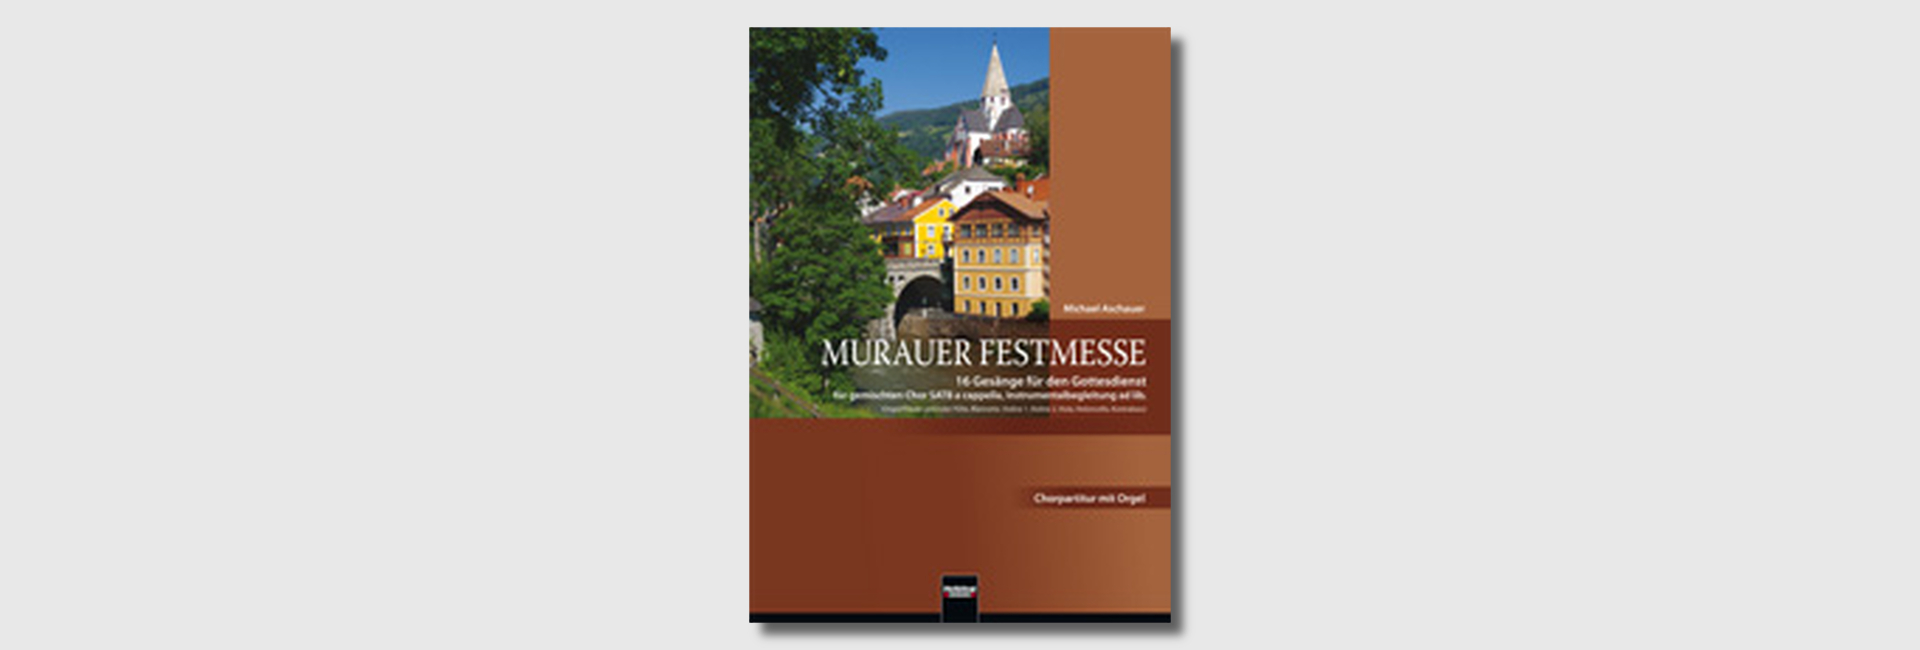 Murauer Festmesse